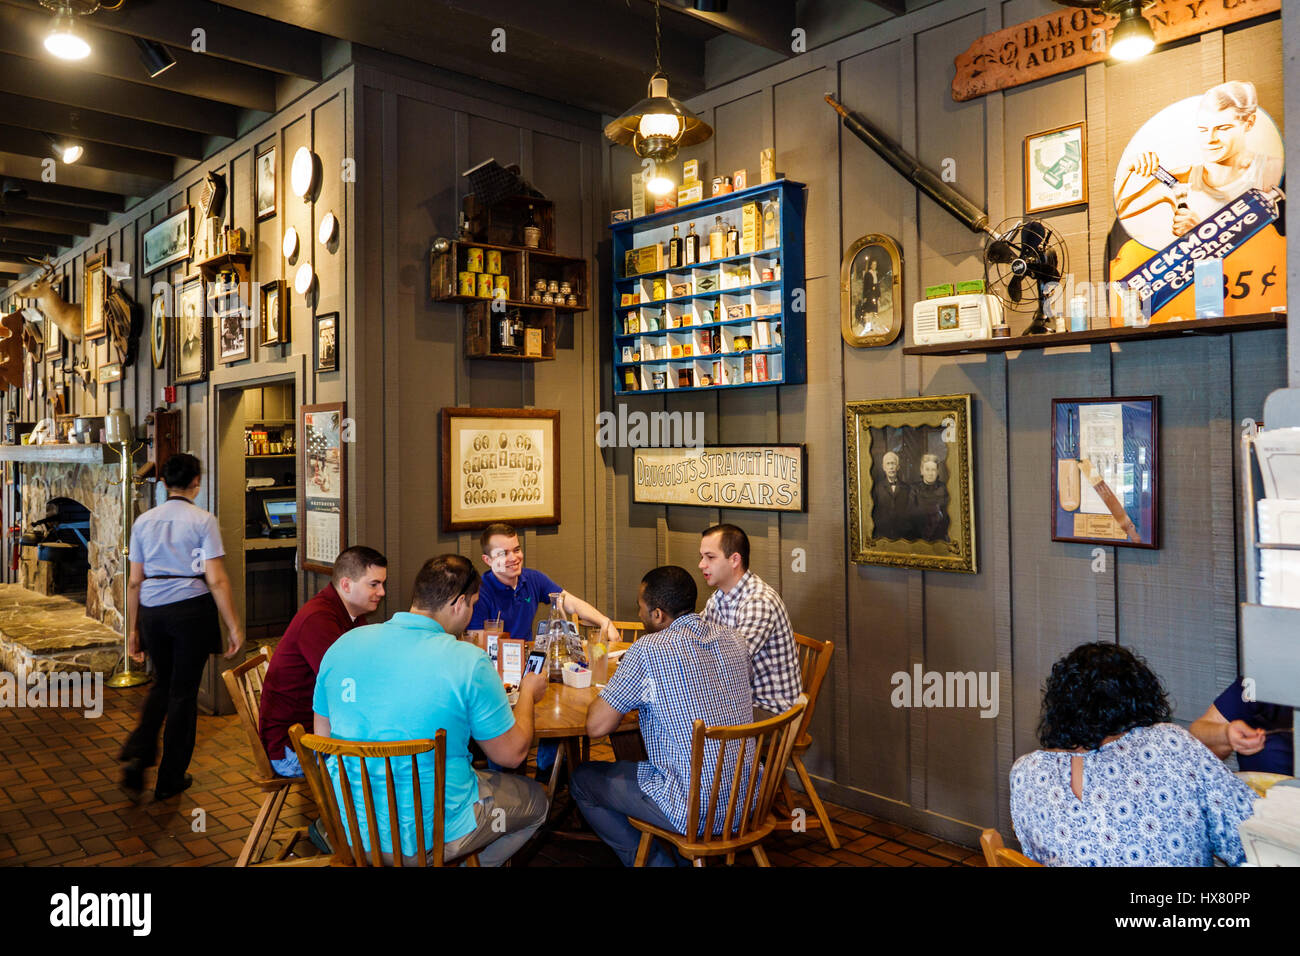 Stuart Florida Cracker Barrel Old Country Store restaurant table d ...